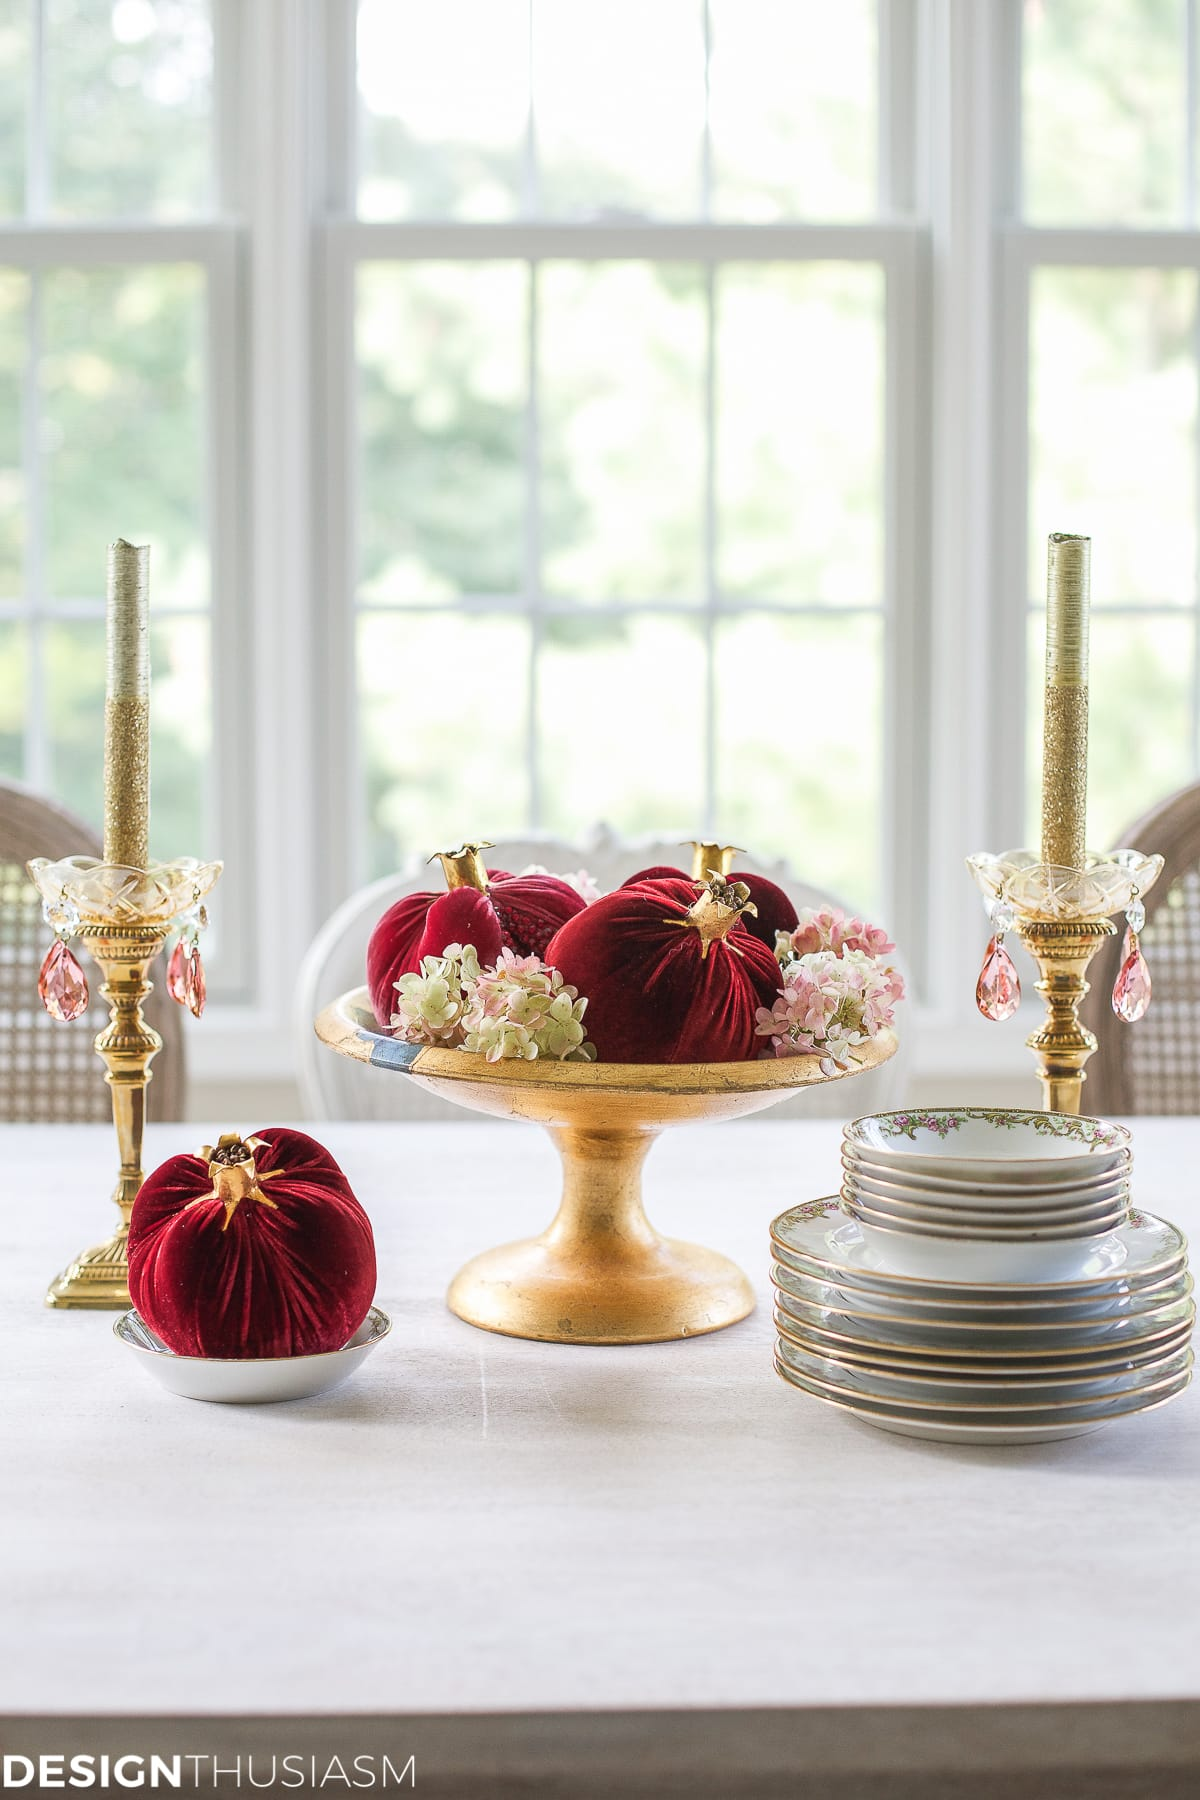 Fall Decorating Ideas | How to Welcome the Season With All 5 Senses - designthusiasm.com